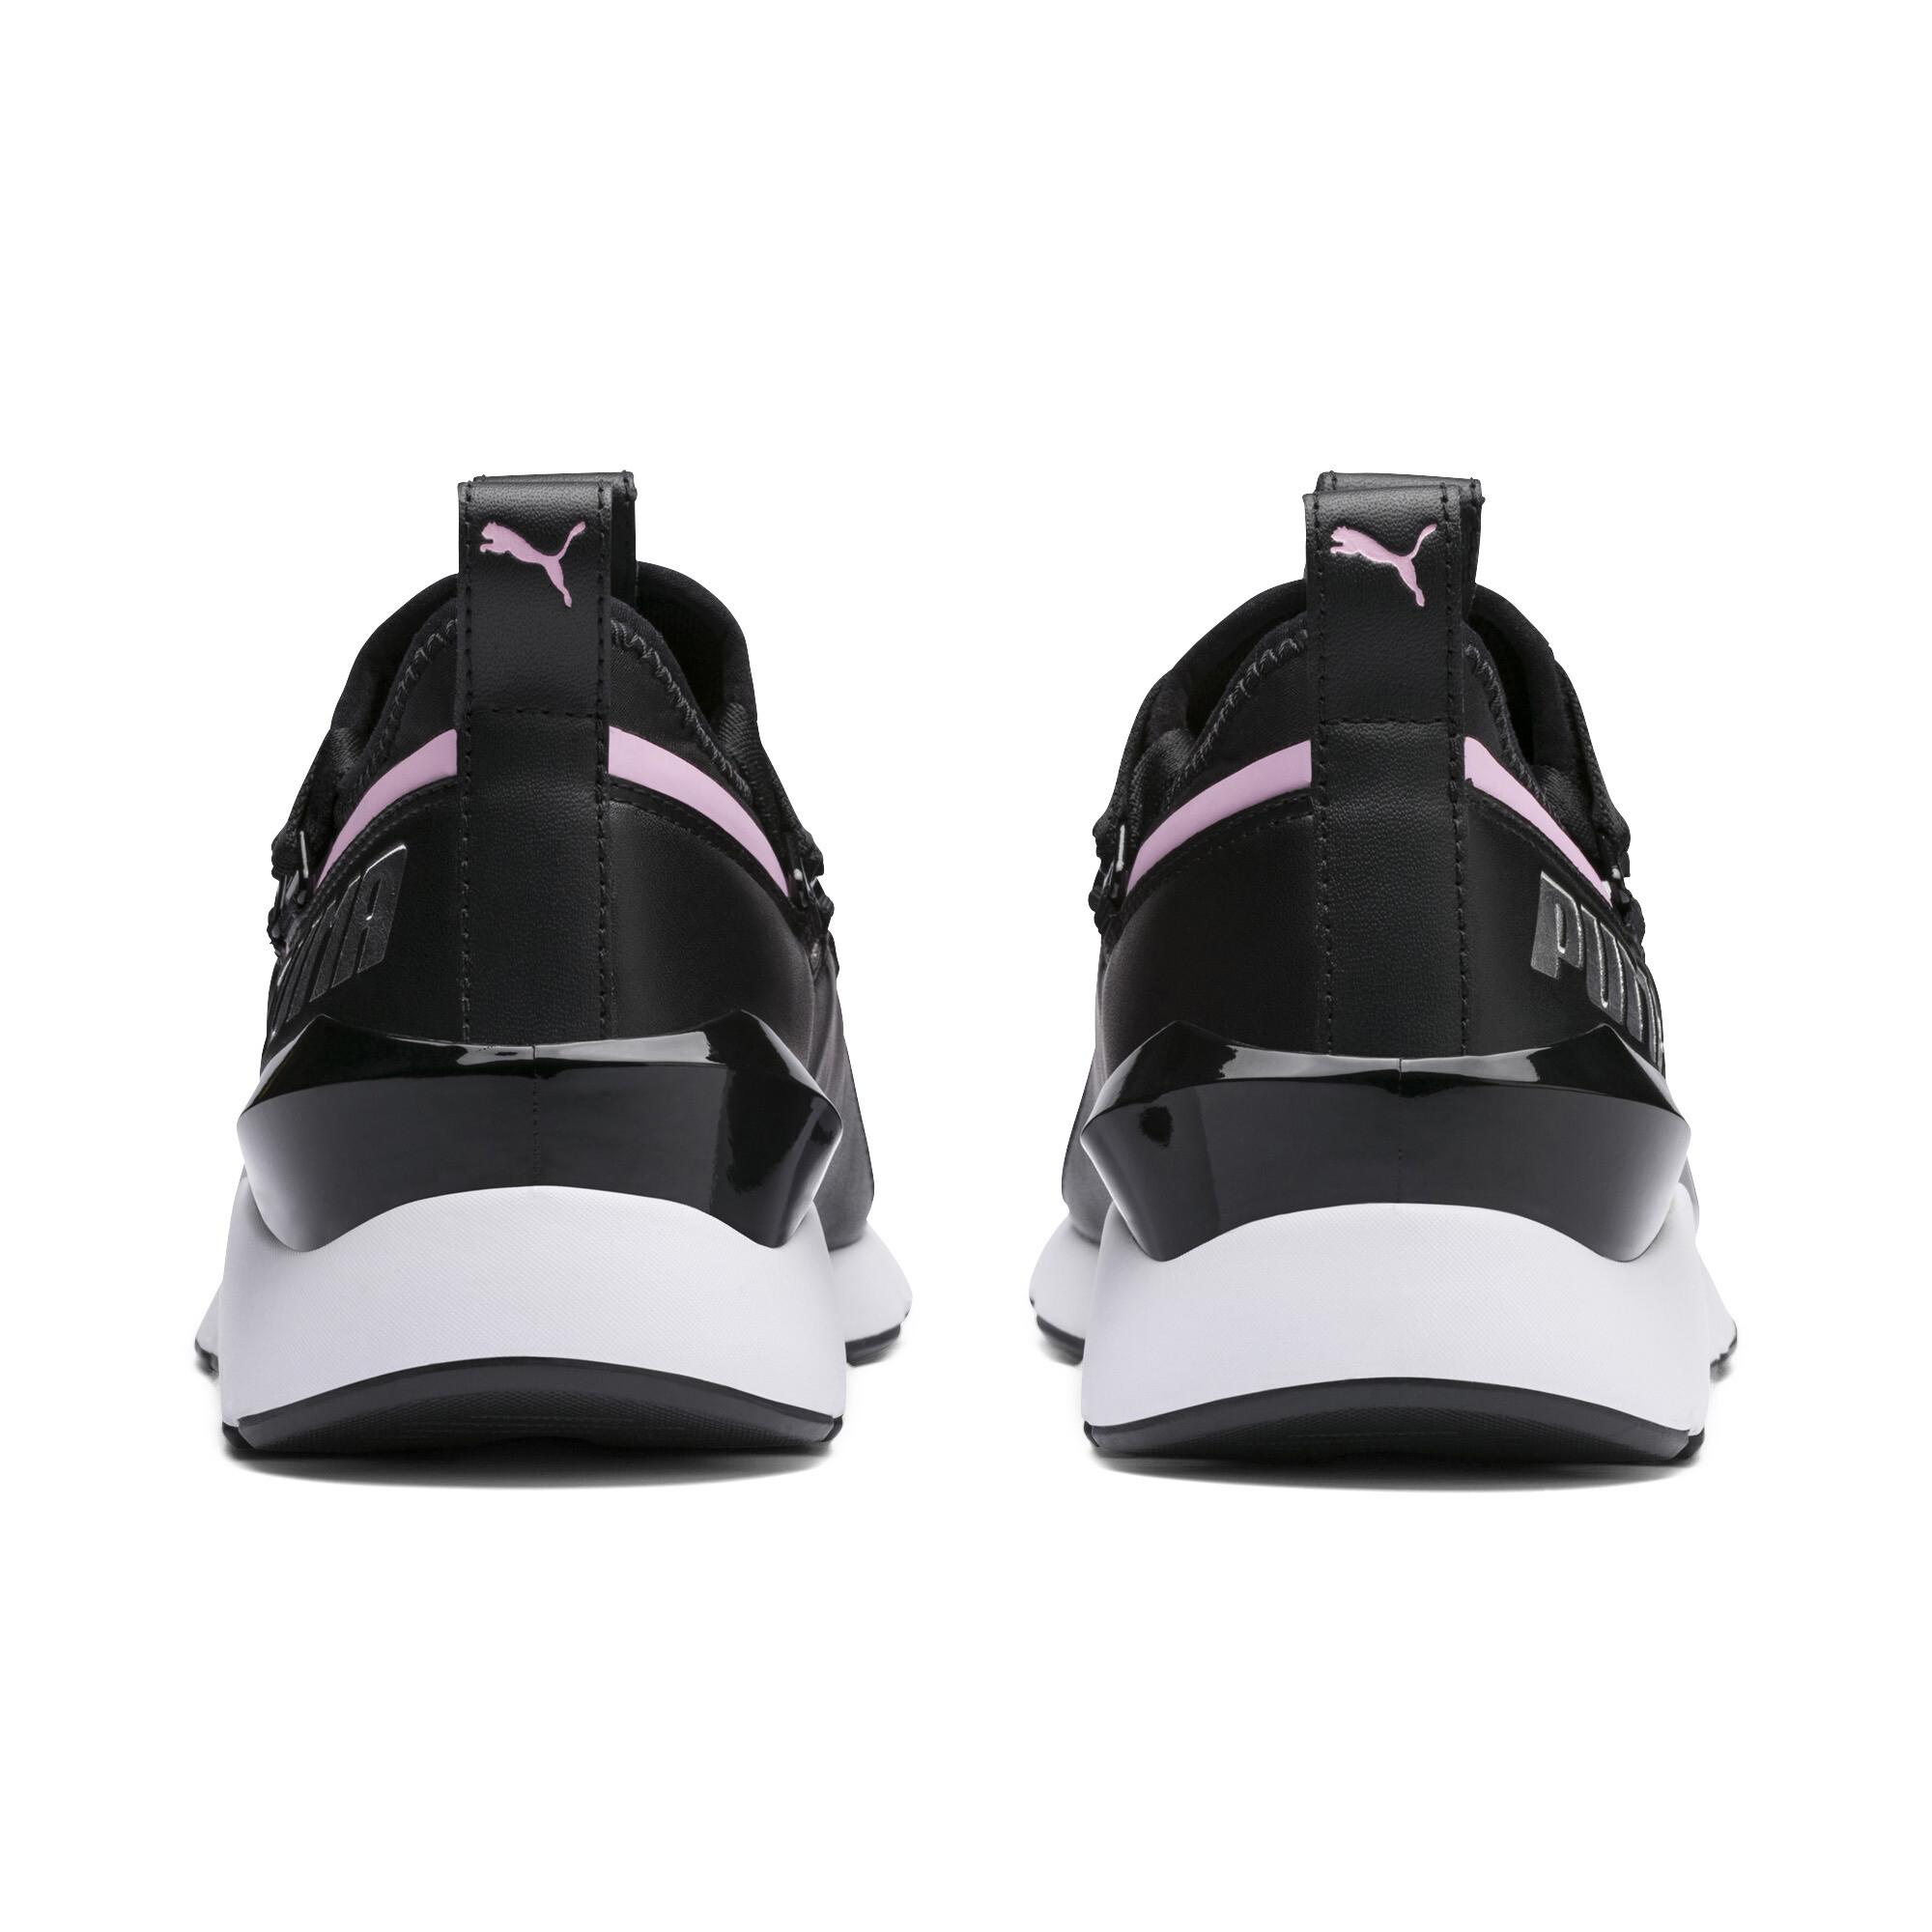 7a57242863 Details about PUMA Muse 2 Trailblazer Women's Sneakers Women Shoe Evolution